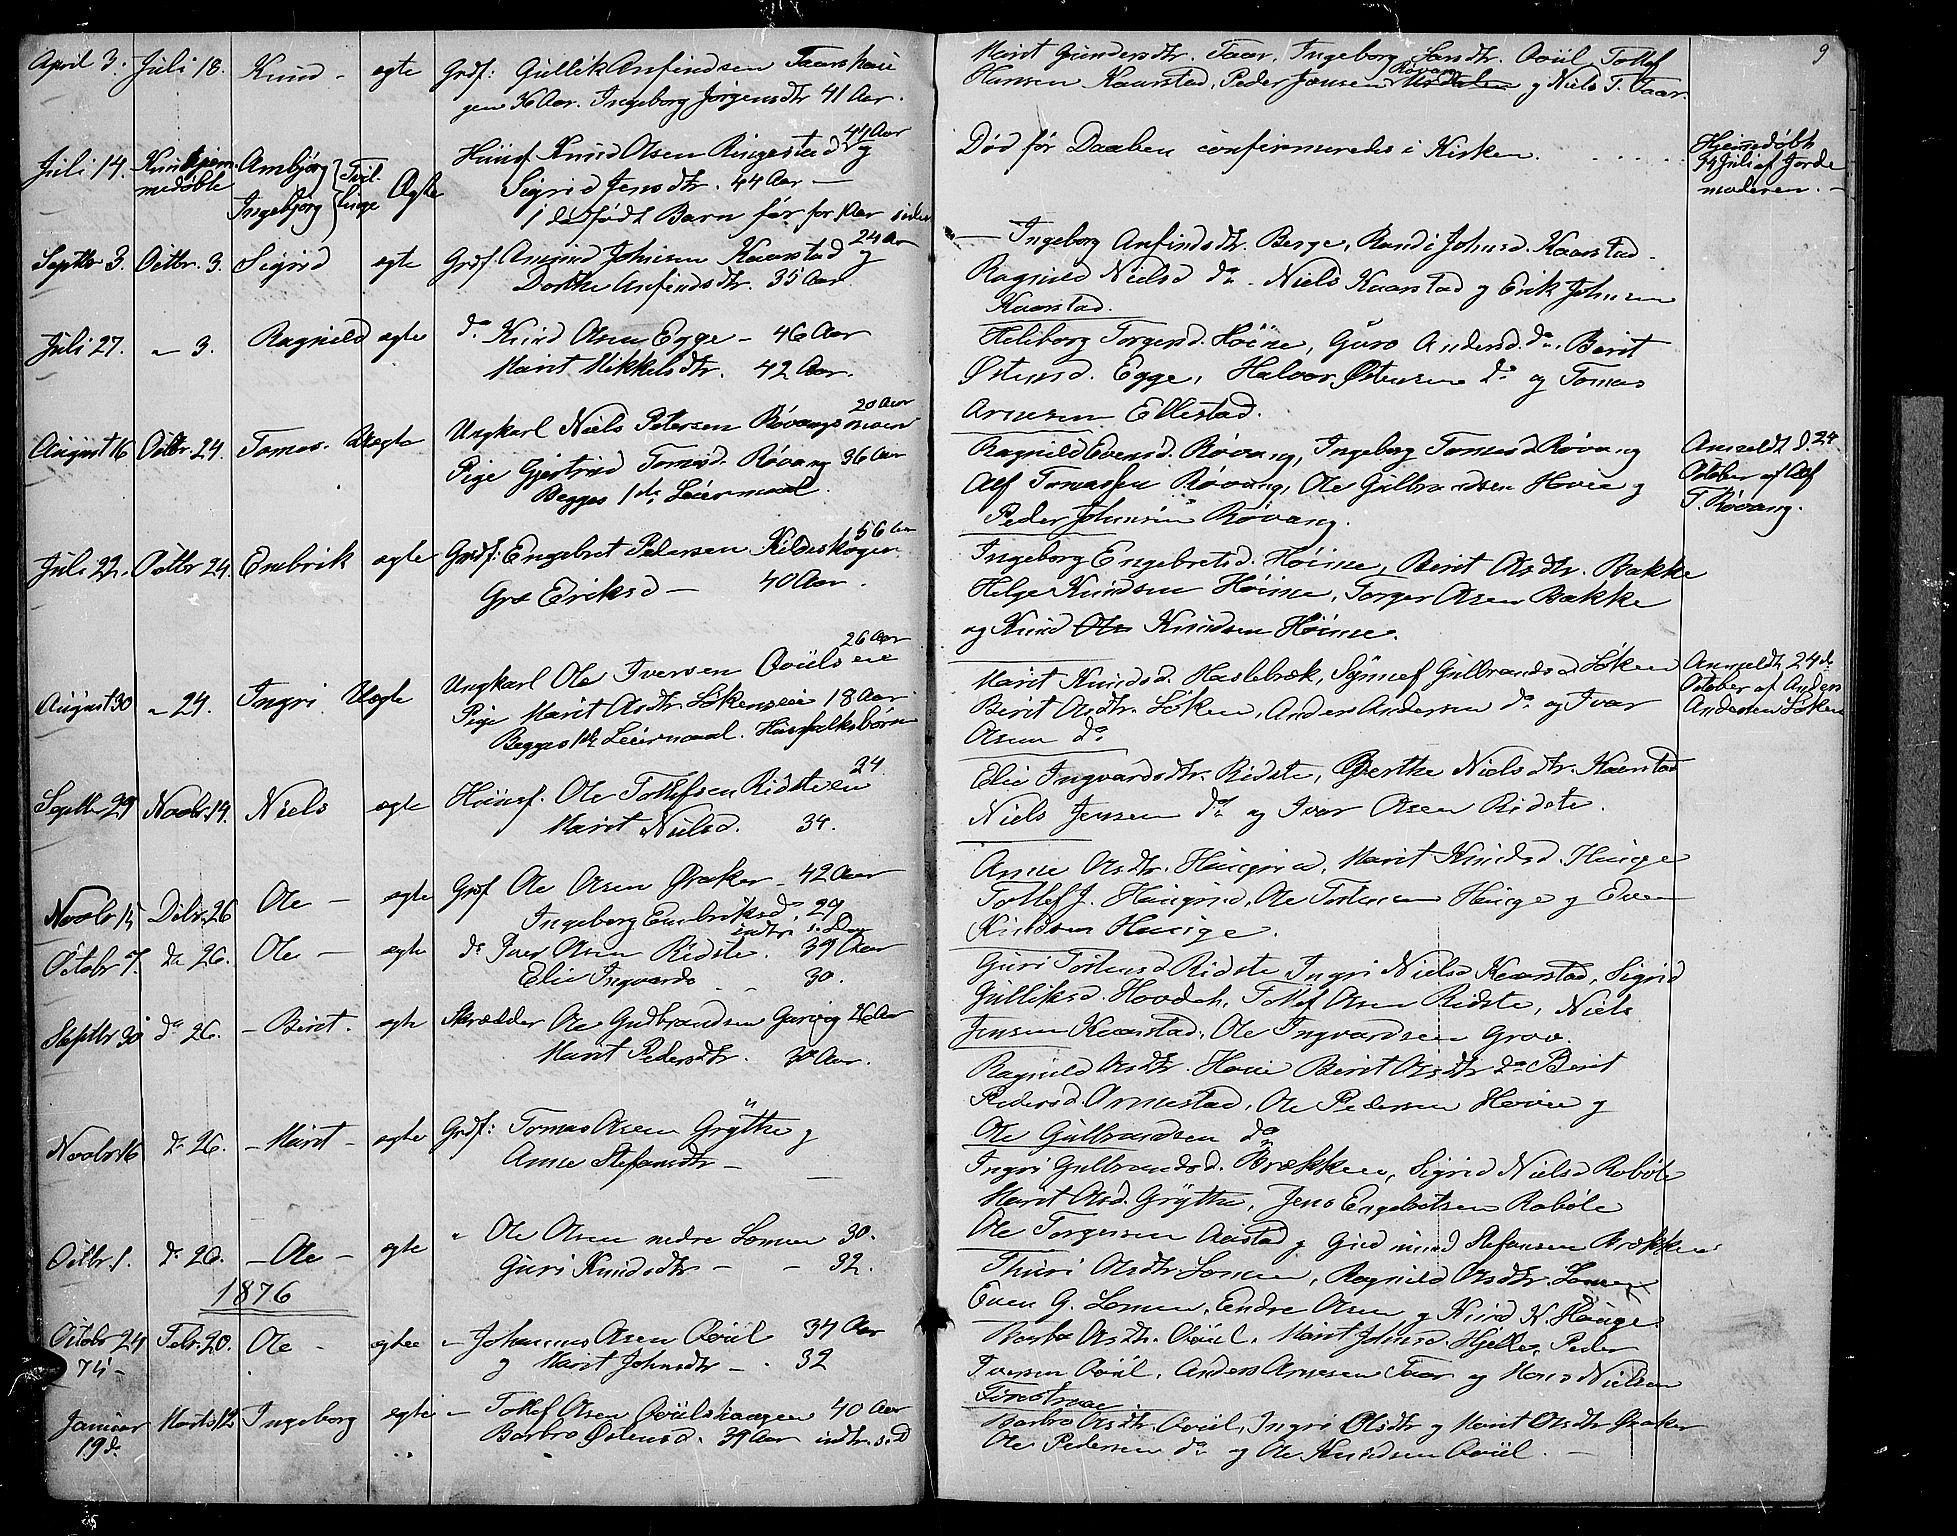 SAH, Vestre Slidre prestekontor, Klokkerbok nr. 2, 1869-1882, s. 9